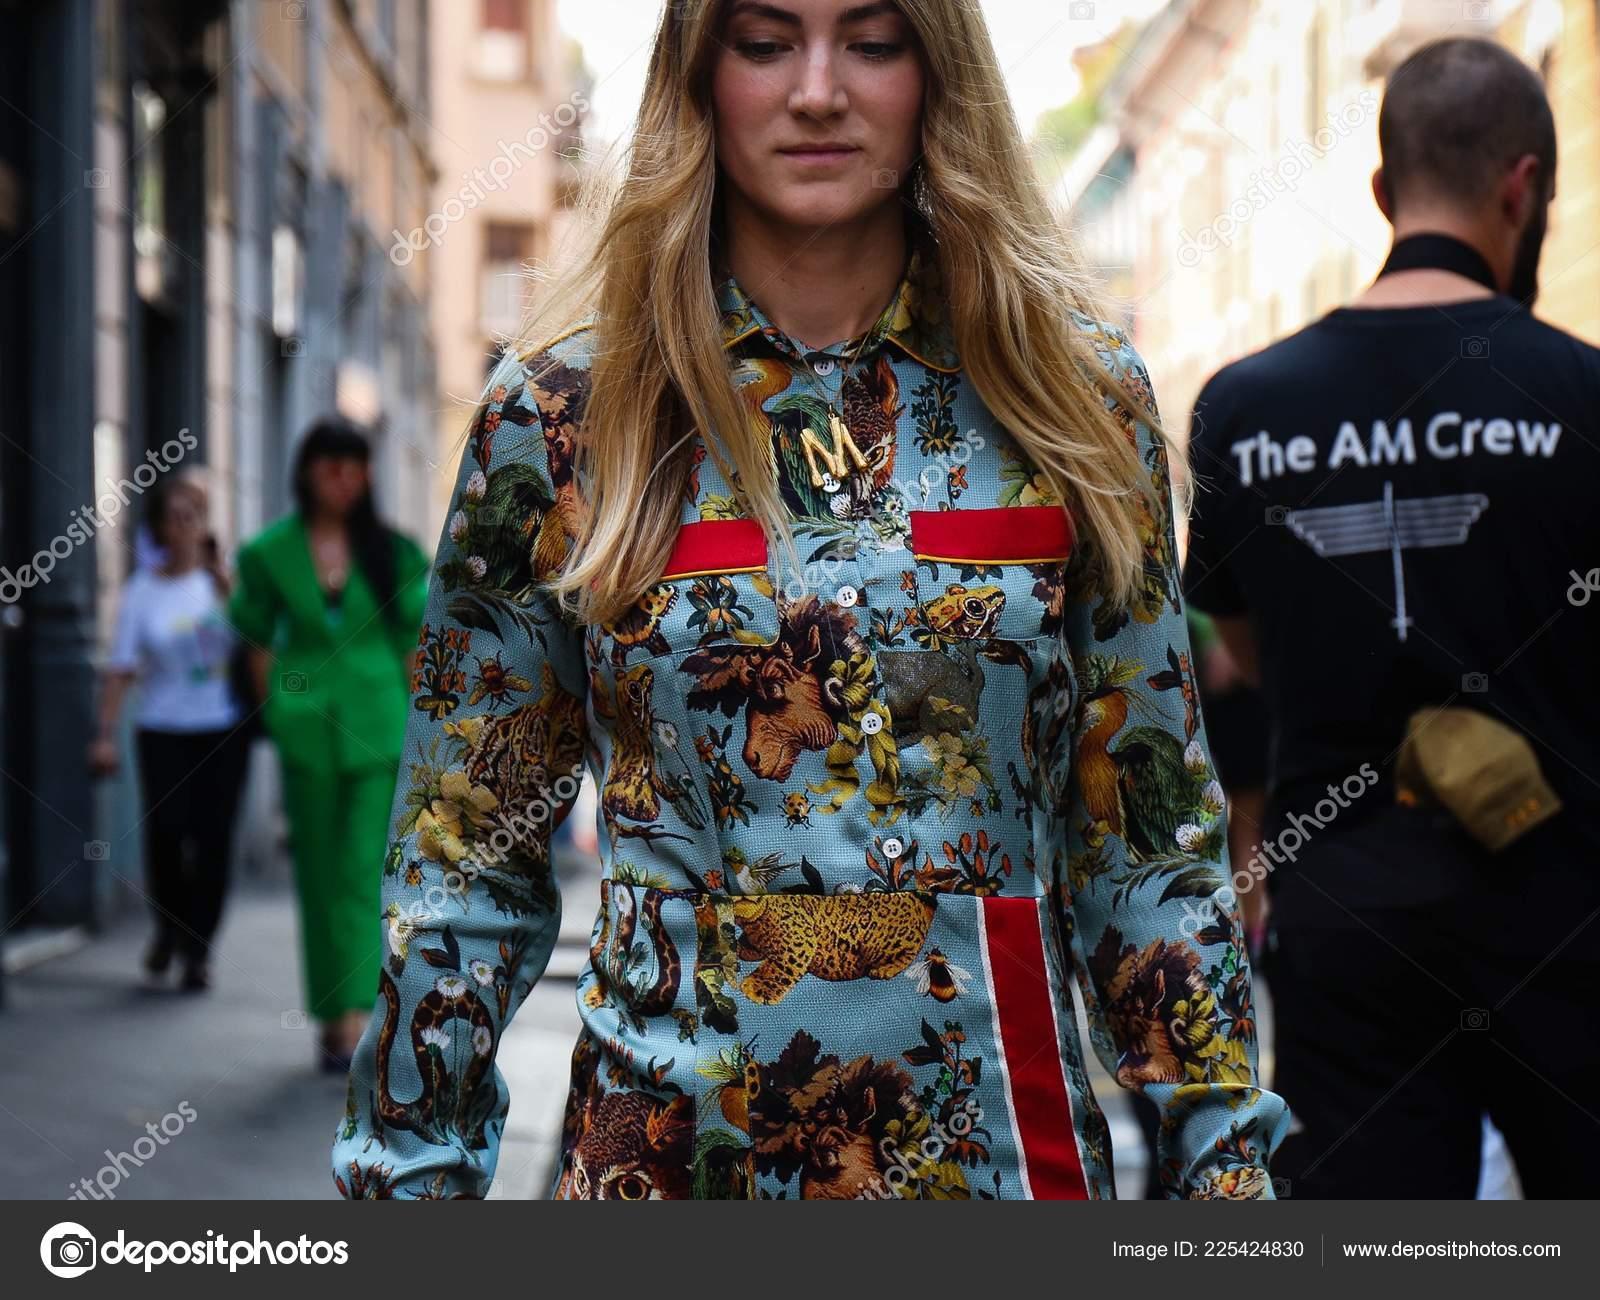 f1e92eee9eaa Μιλάνο Ιταλία Σεπτεμβρίου 2018 Γυναίκες Στο Δρόμο Κατά Διάρκεια Της —  Φωτογραφία Αρχείου